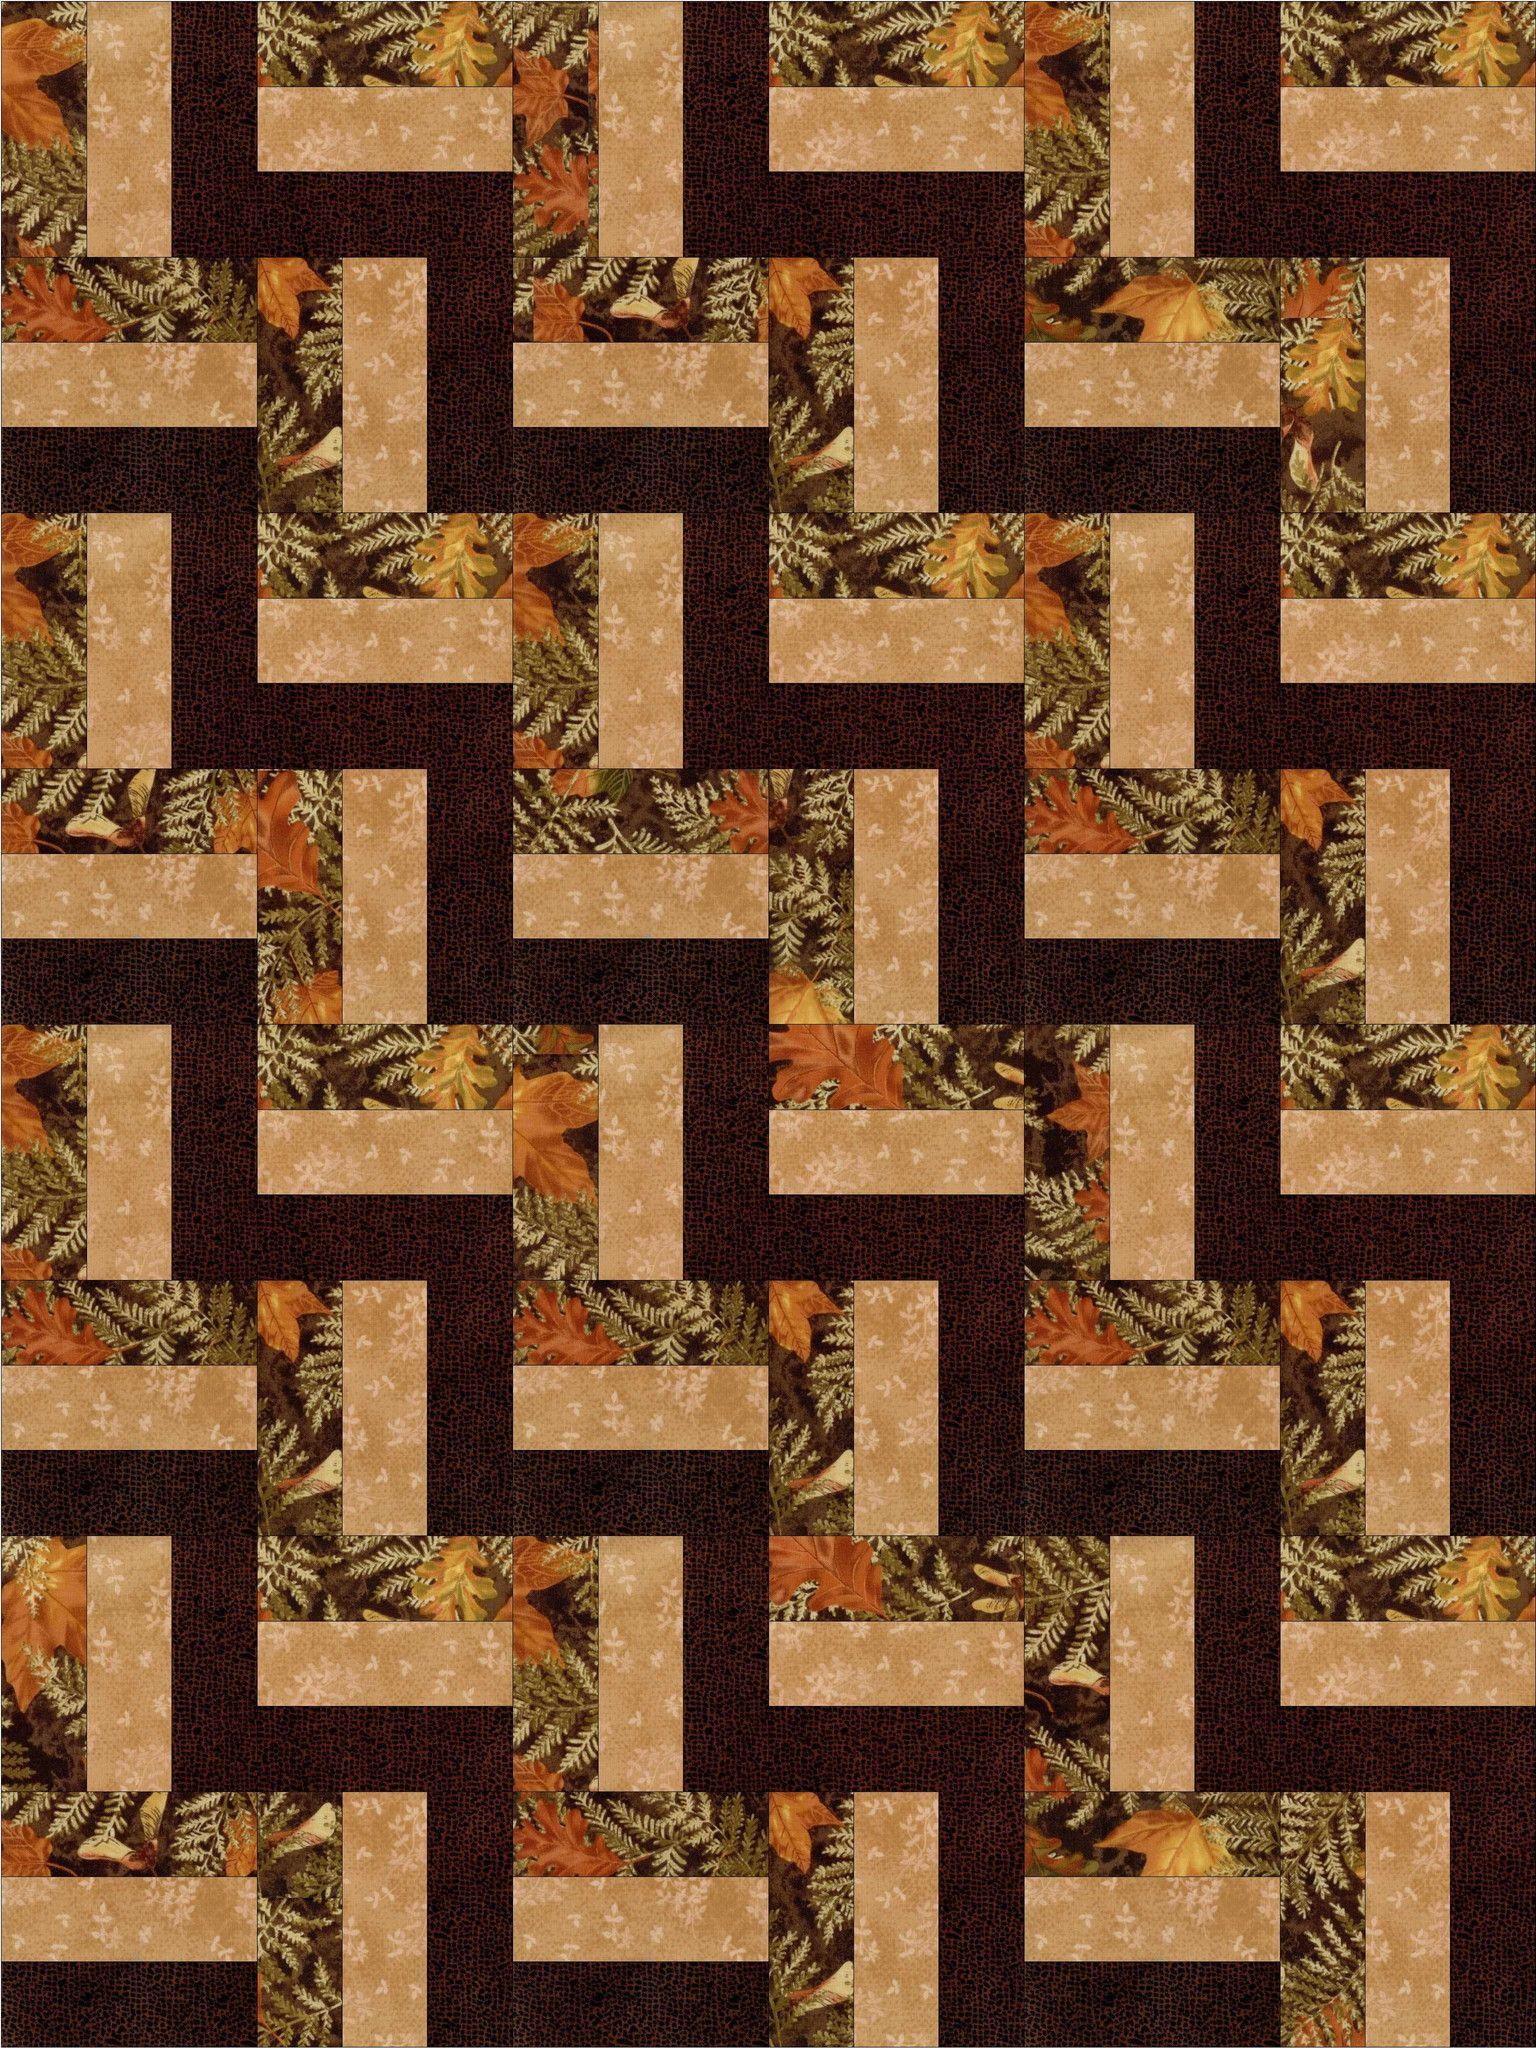 Fall Leaves Quilt Kit PreCut Blocks | quilting | Pinterest | Fall ... : pre cut quilt kits for beginners - Adamdwight.com